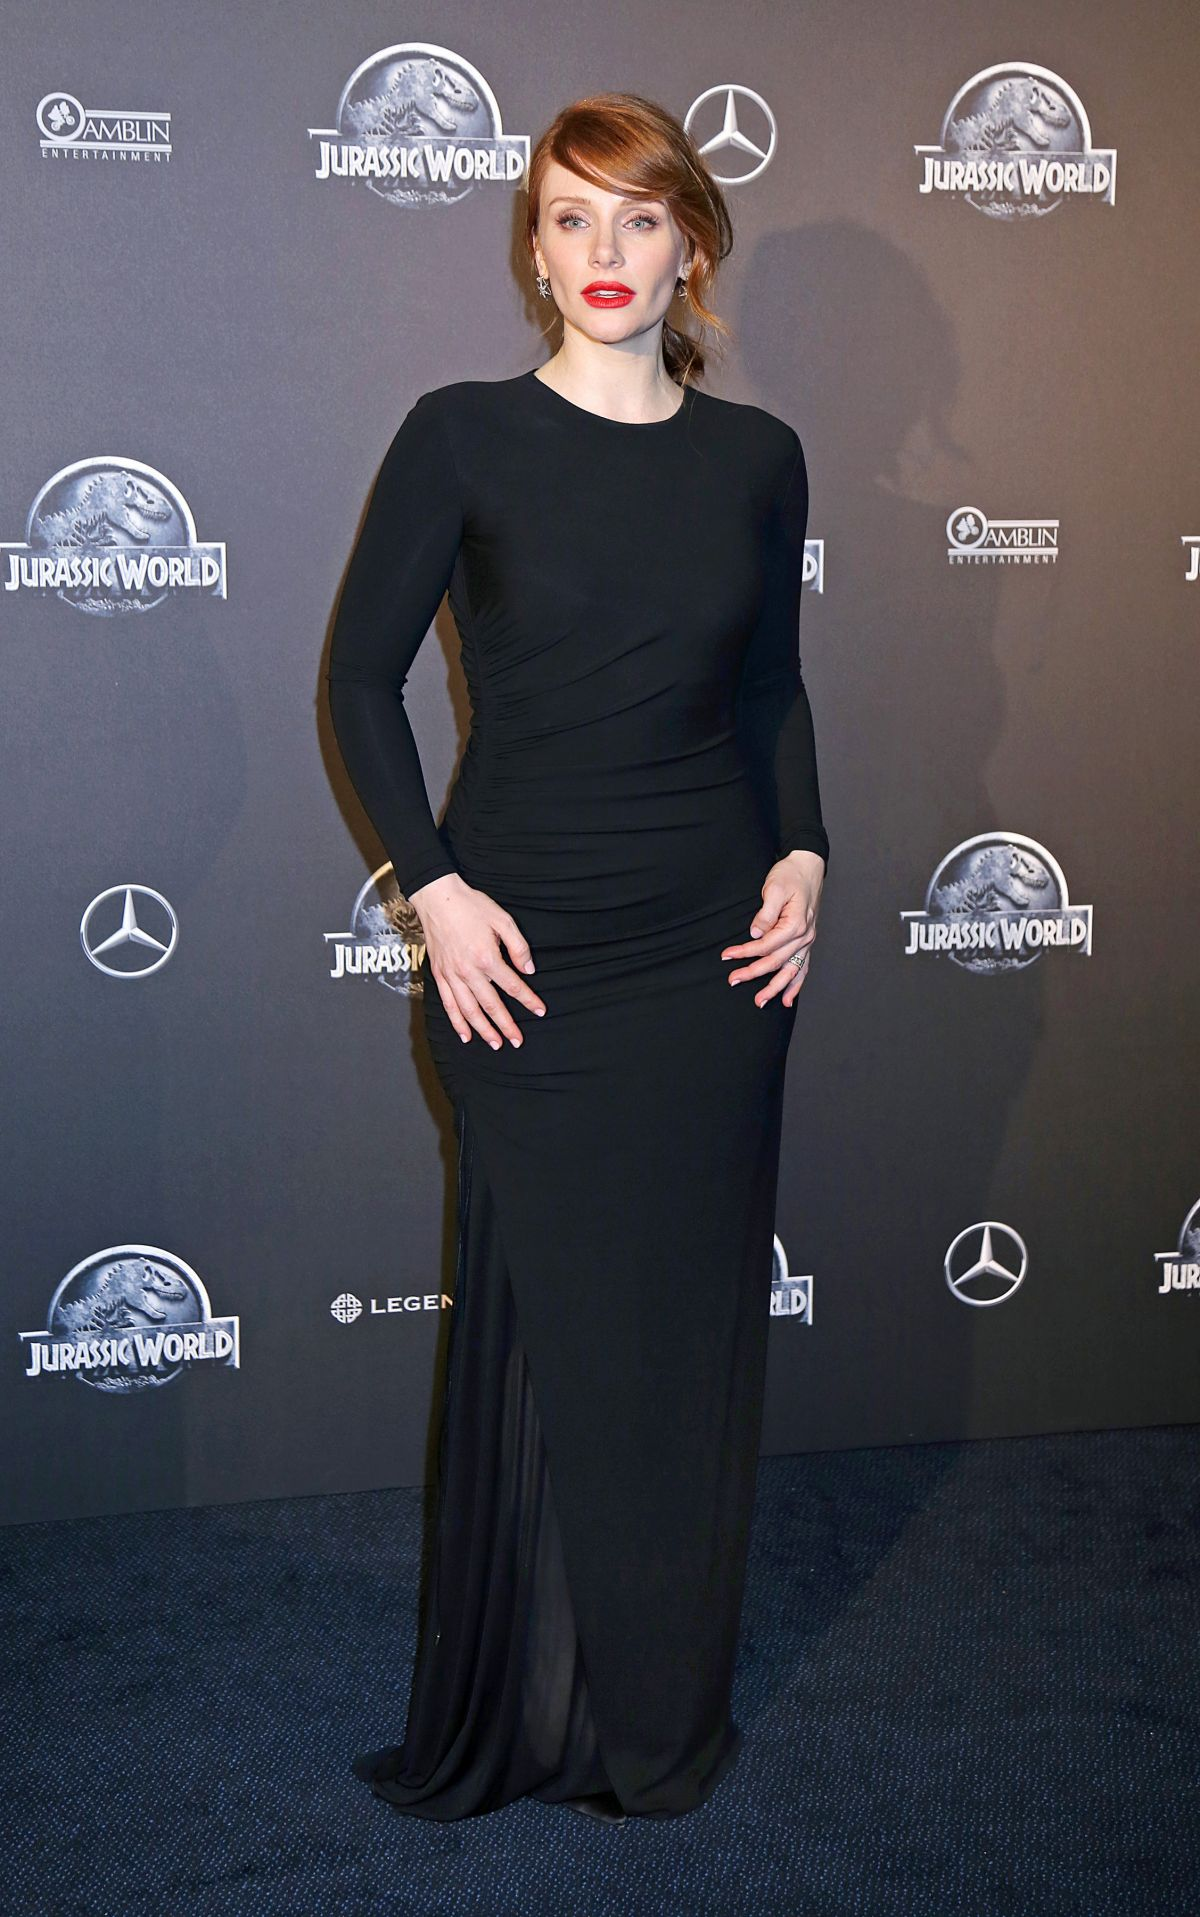 BRYCE DALLAS HOWARD at Jurassic World Premiere in Paris